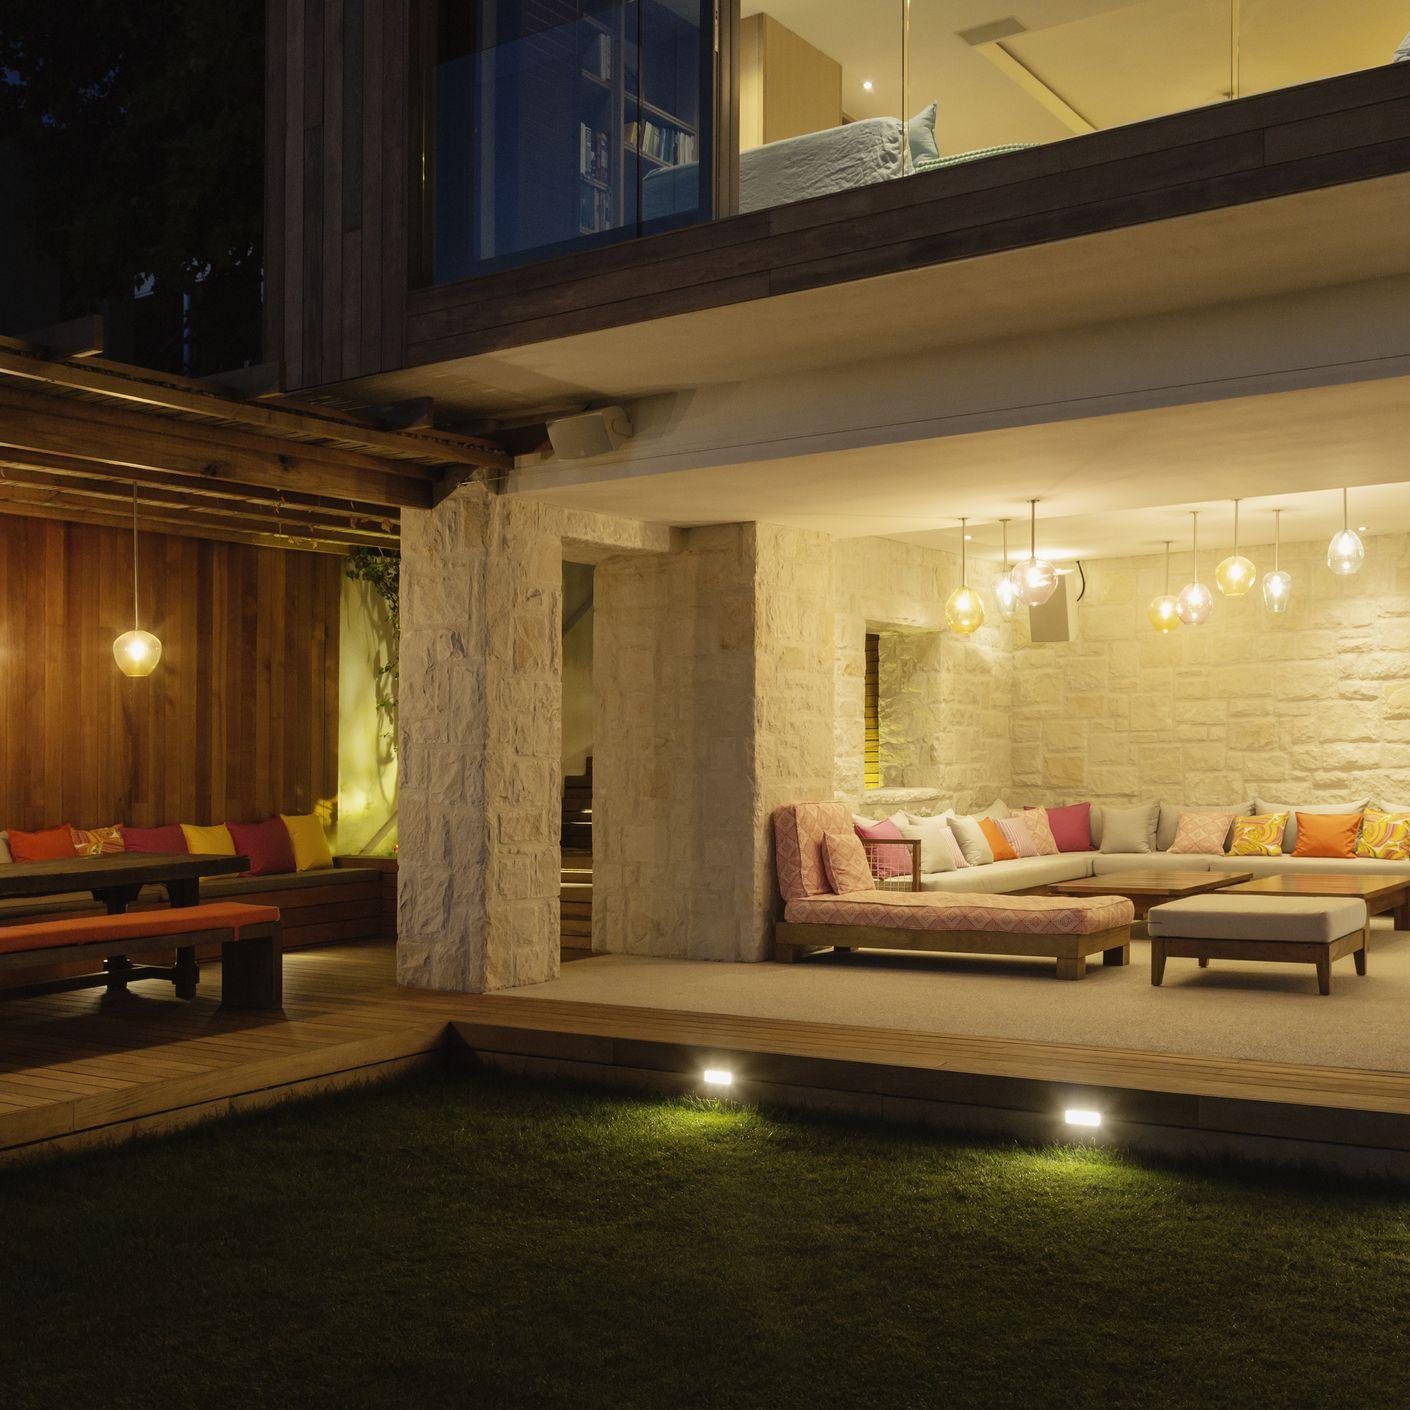 16 Outdoor Lighting Designs to Spark Ideas